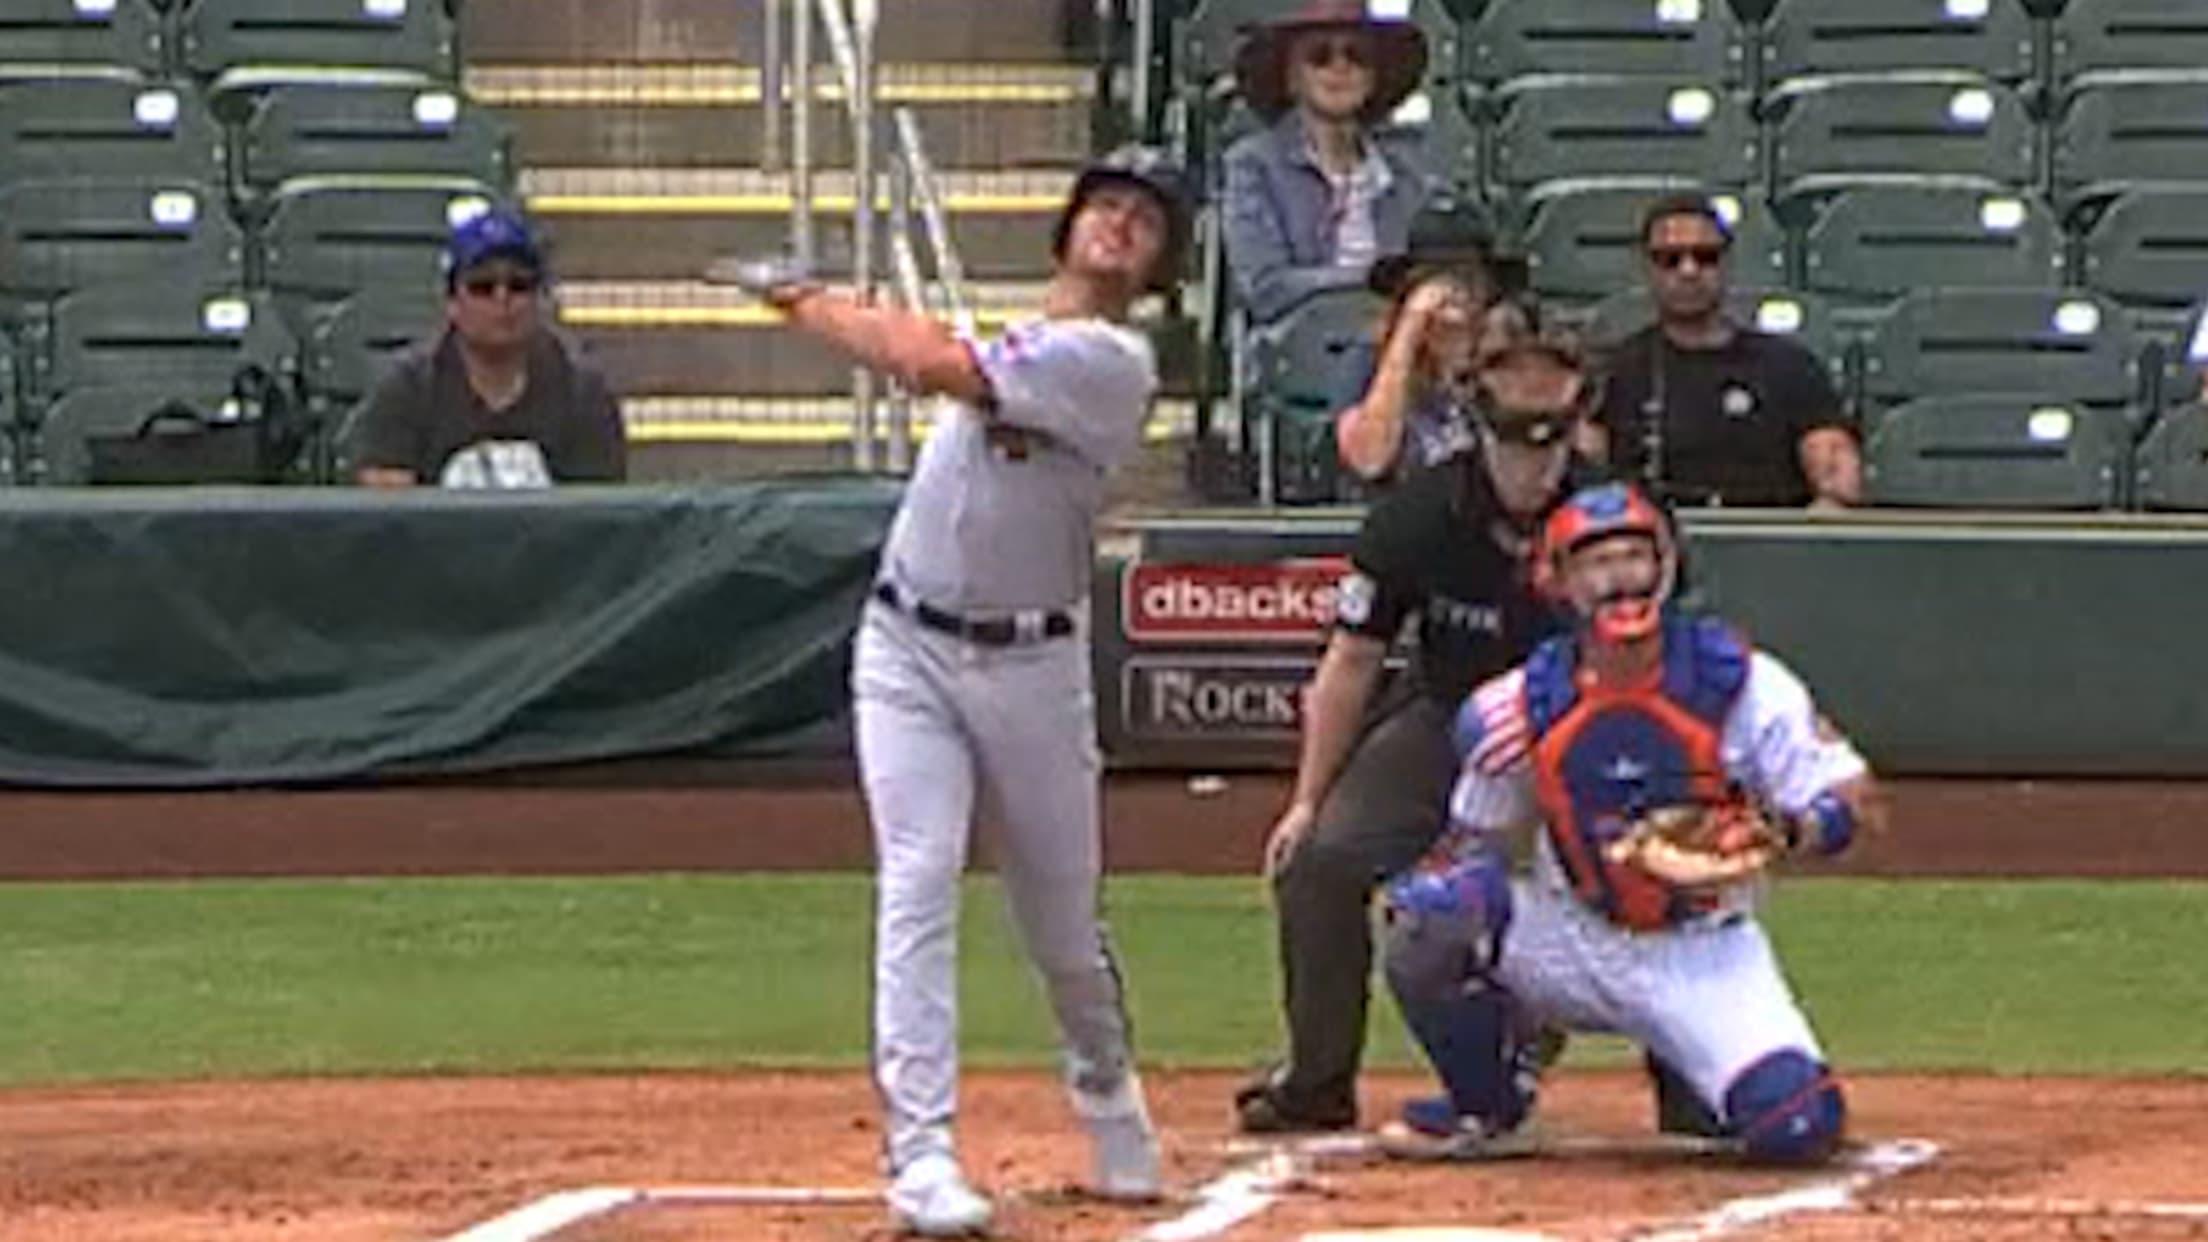 Matt Wallner's solo home run